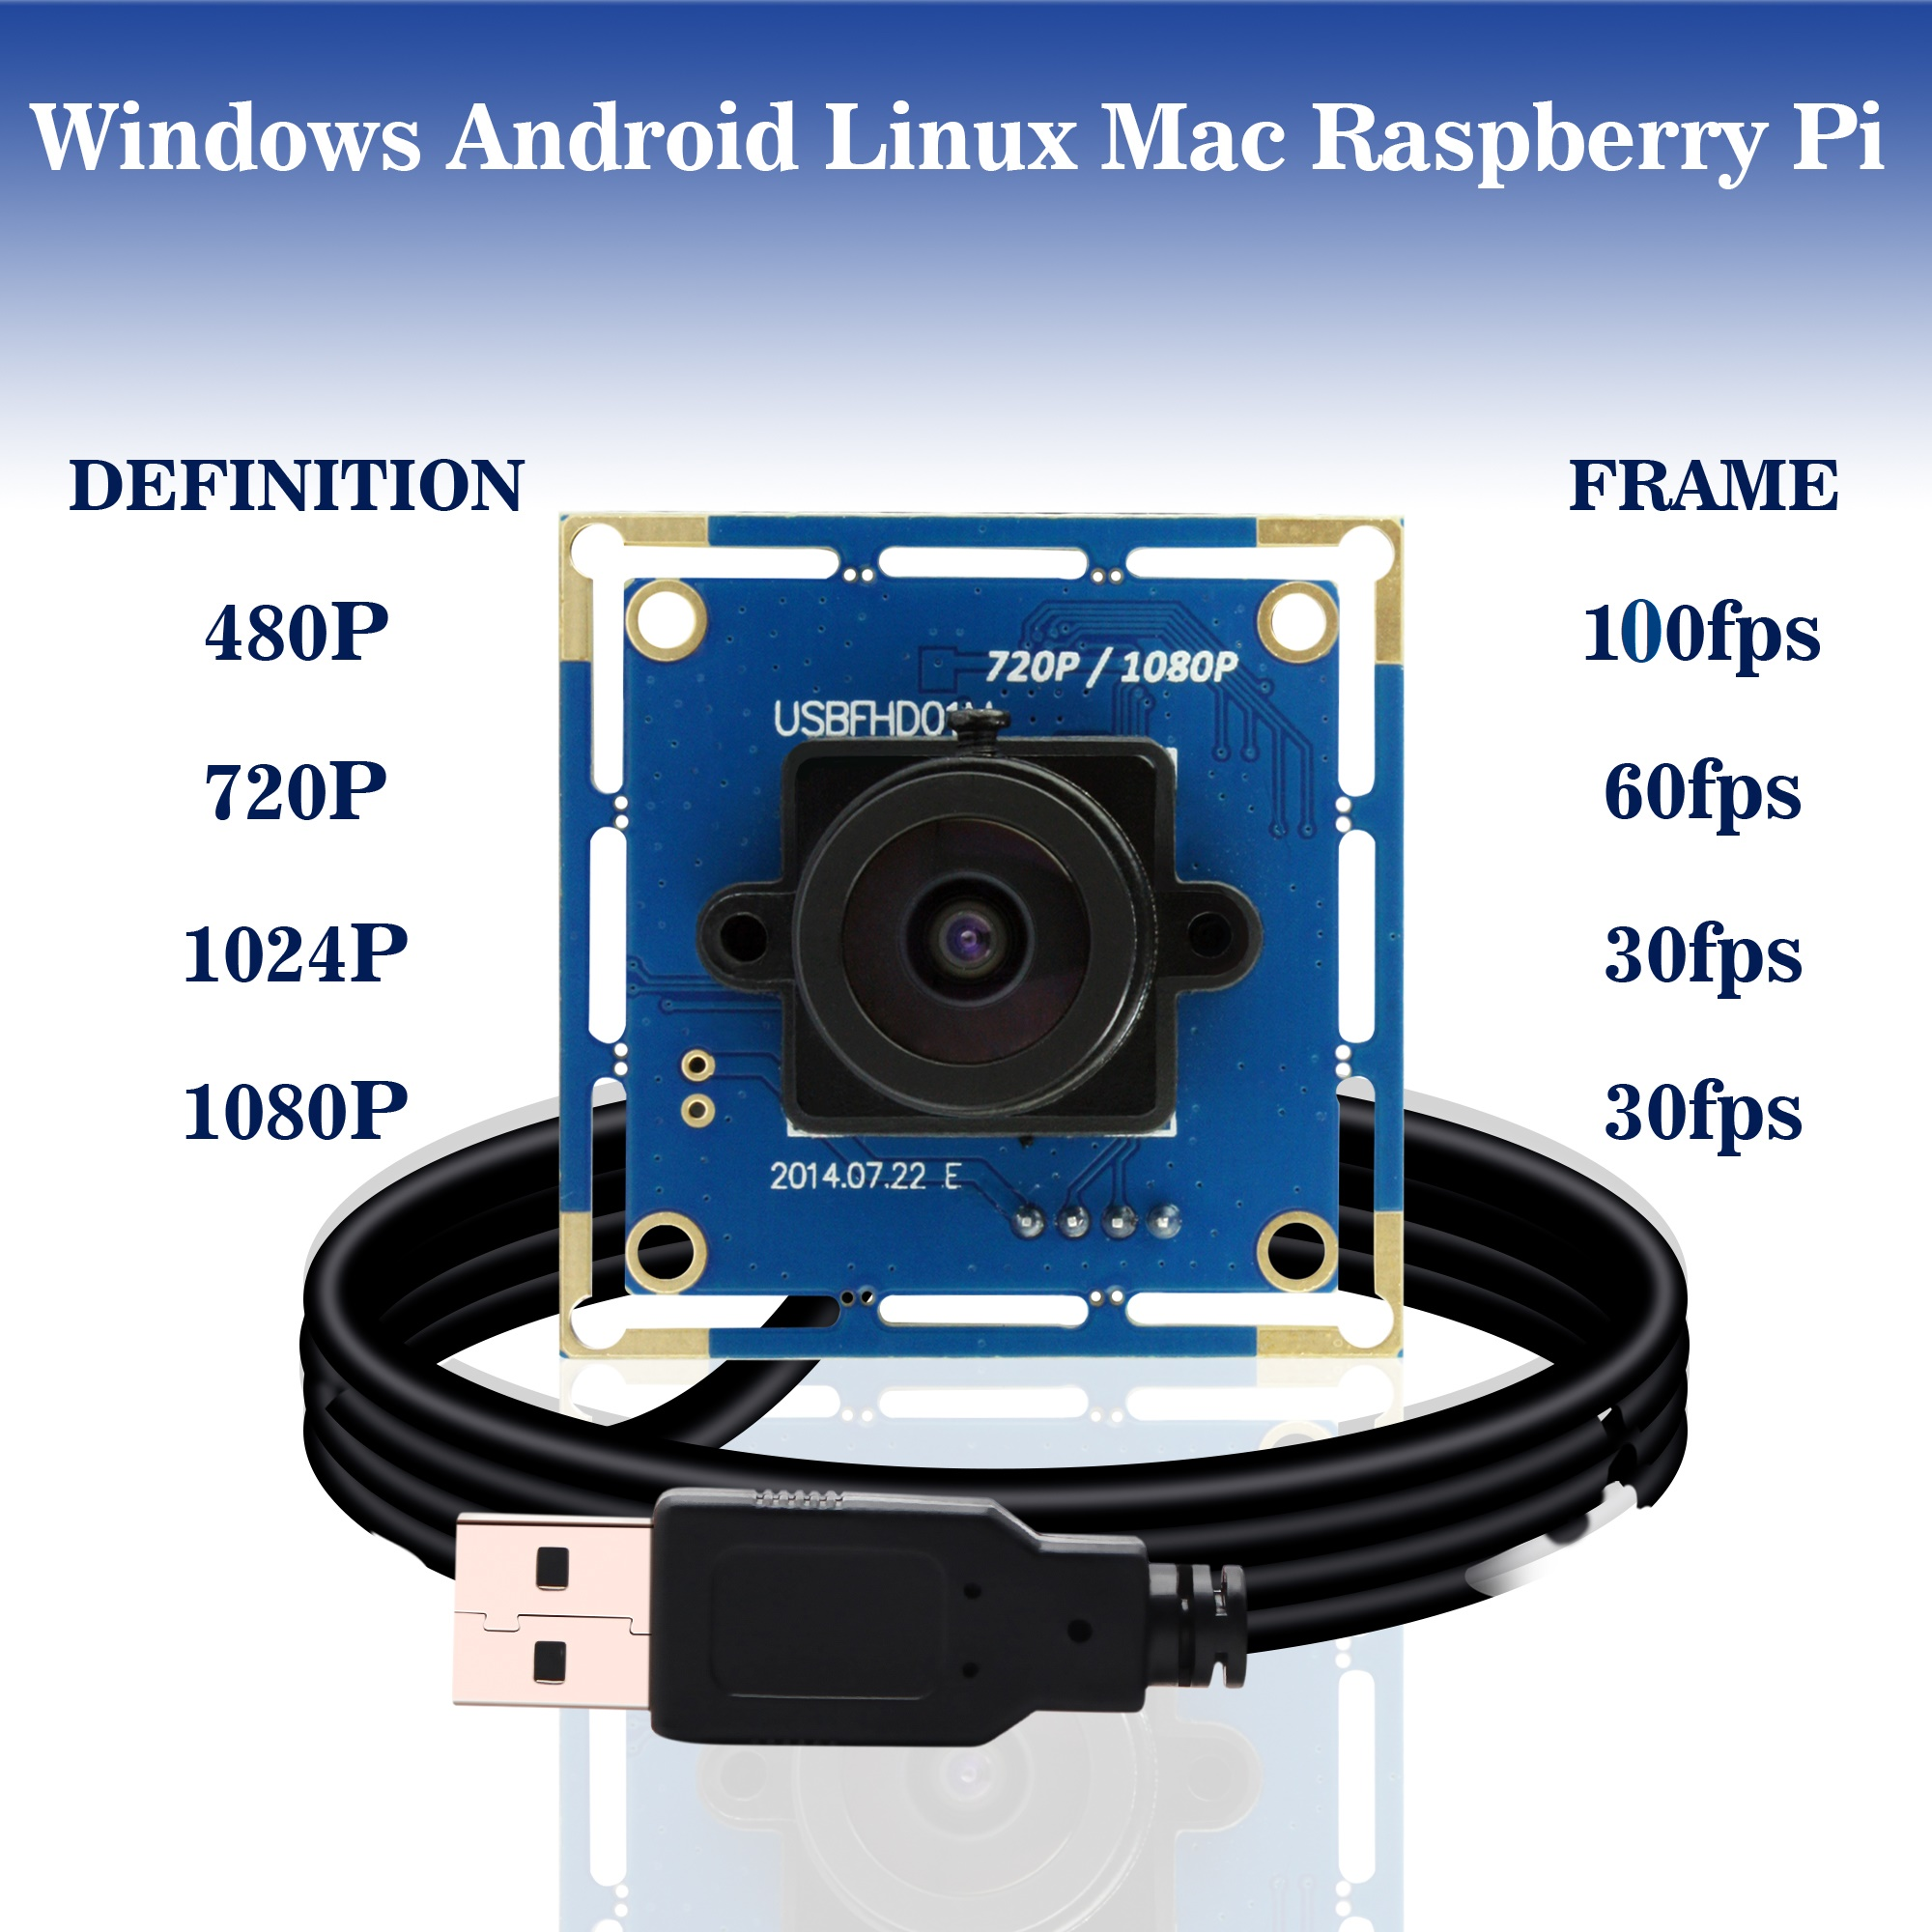 1080p Full Hd MJPEG 30fps/60fps/100fps High Speed CMOS OV2710 Wide Angle Mini CCTV Android Linux  UVC Webcam Usb Camera Module